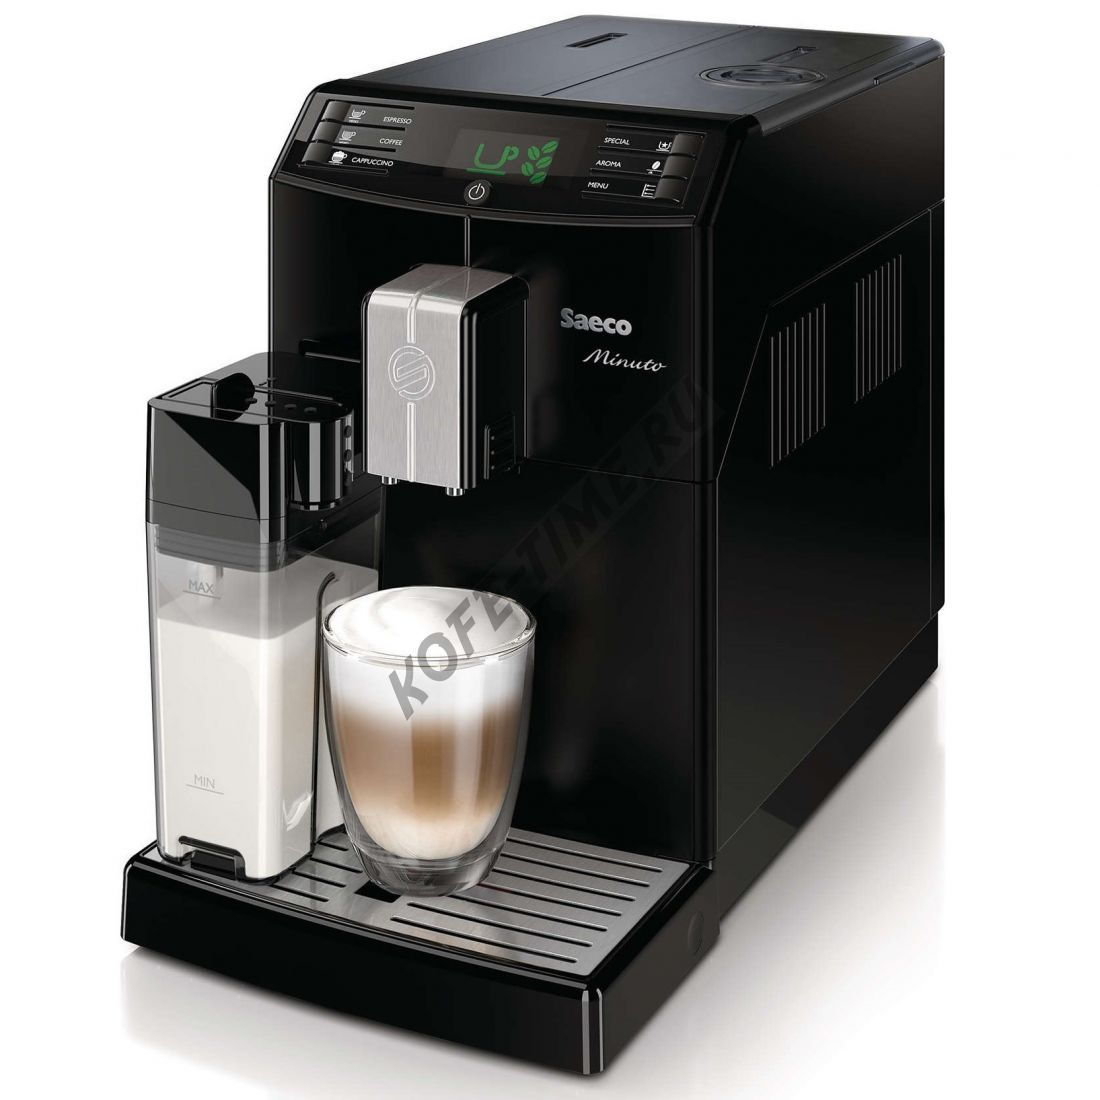 Кофемашина Saeco HD 8763 Minuto